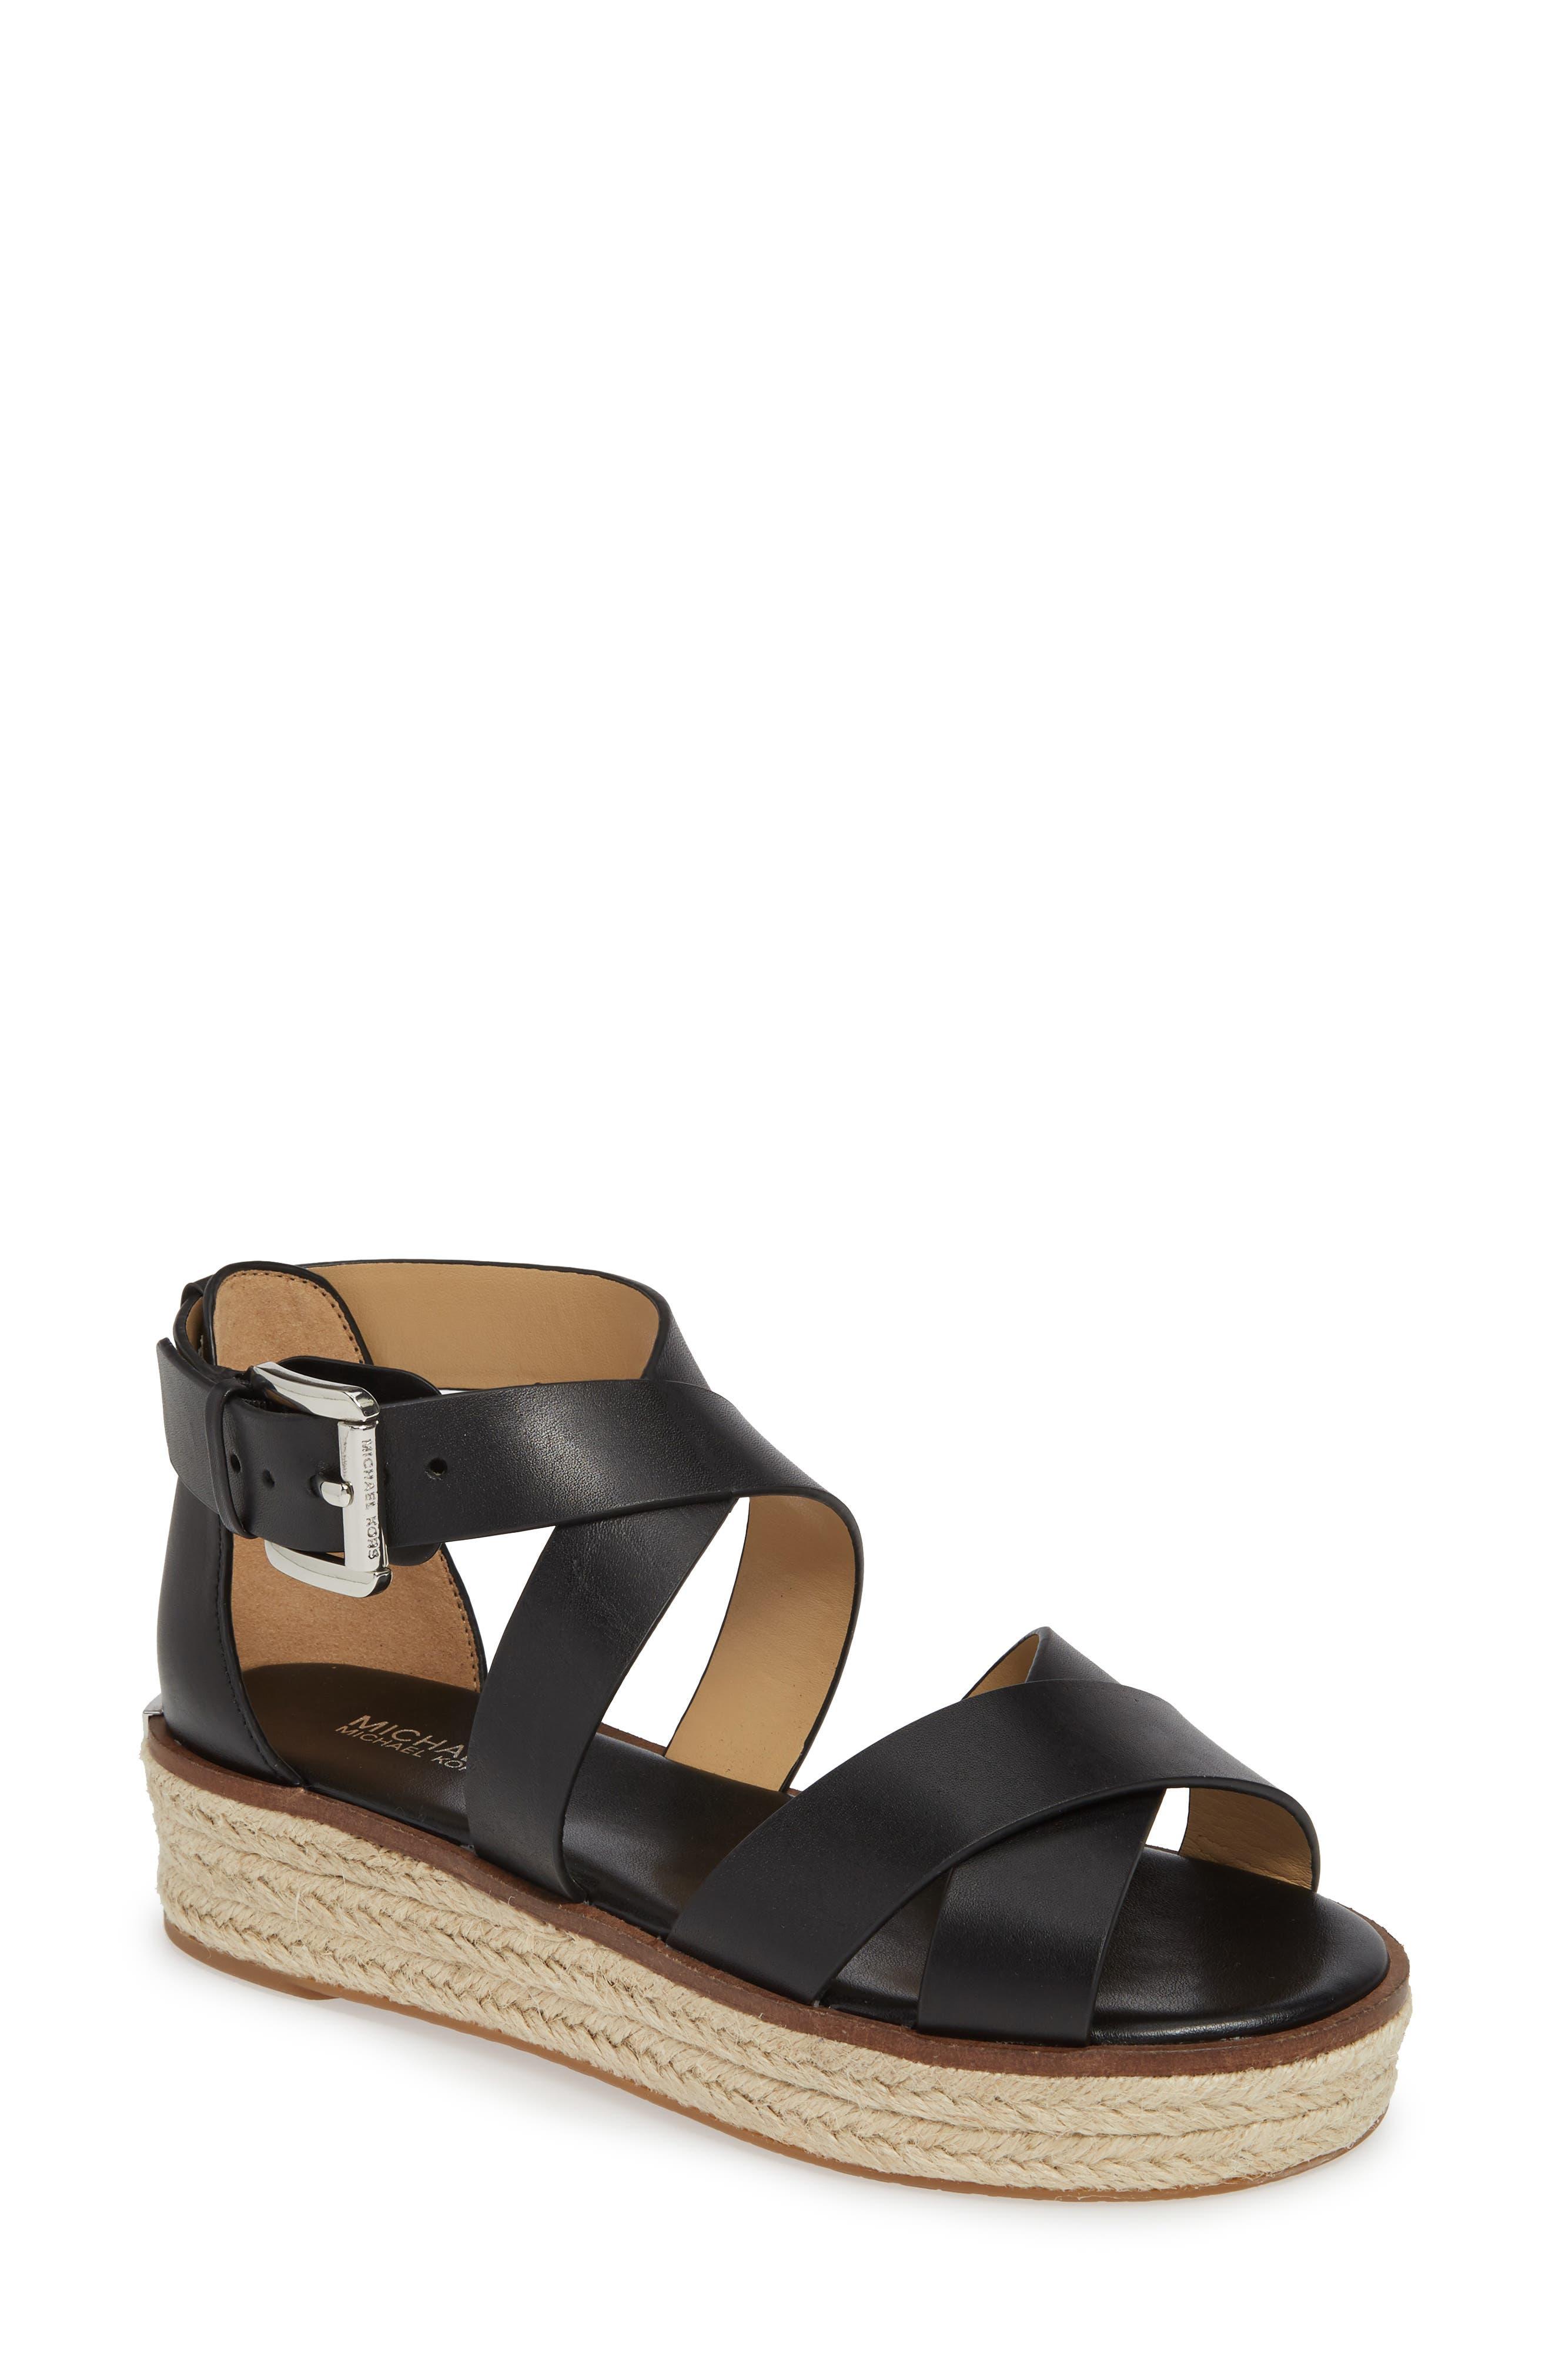 'Darby' Crisscross Espadrille Sandal, Main, color, BLACK VACHETTA LEATHER